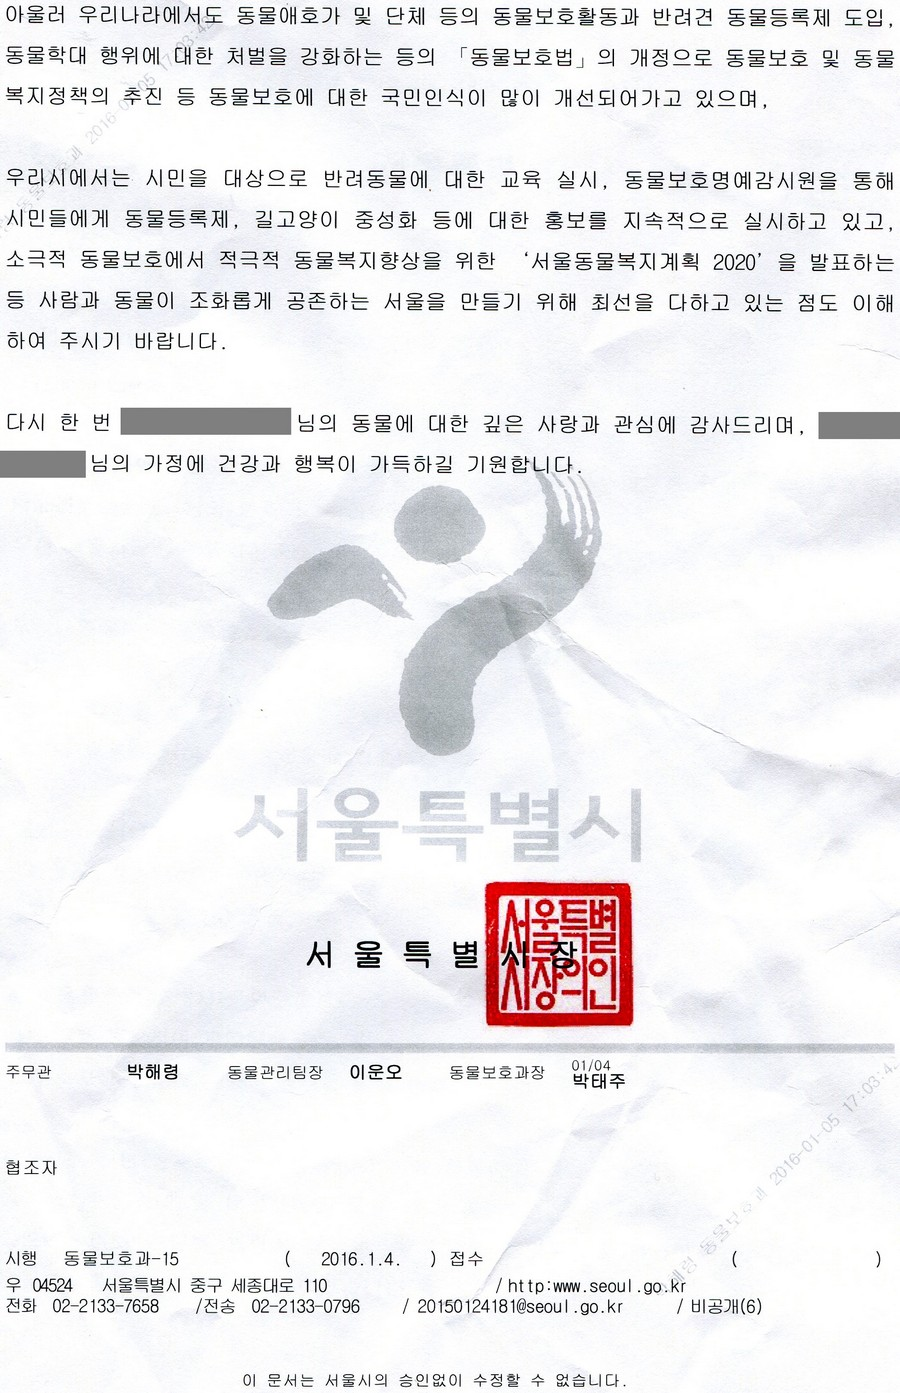 Page 2 of 2 KOREAN version_Seoul Response